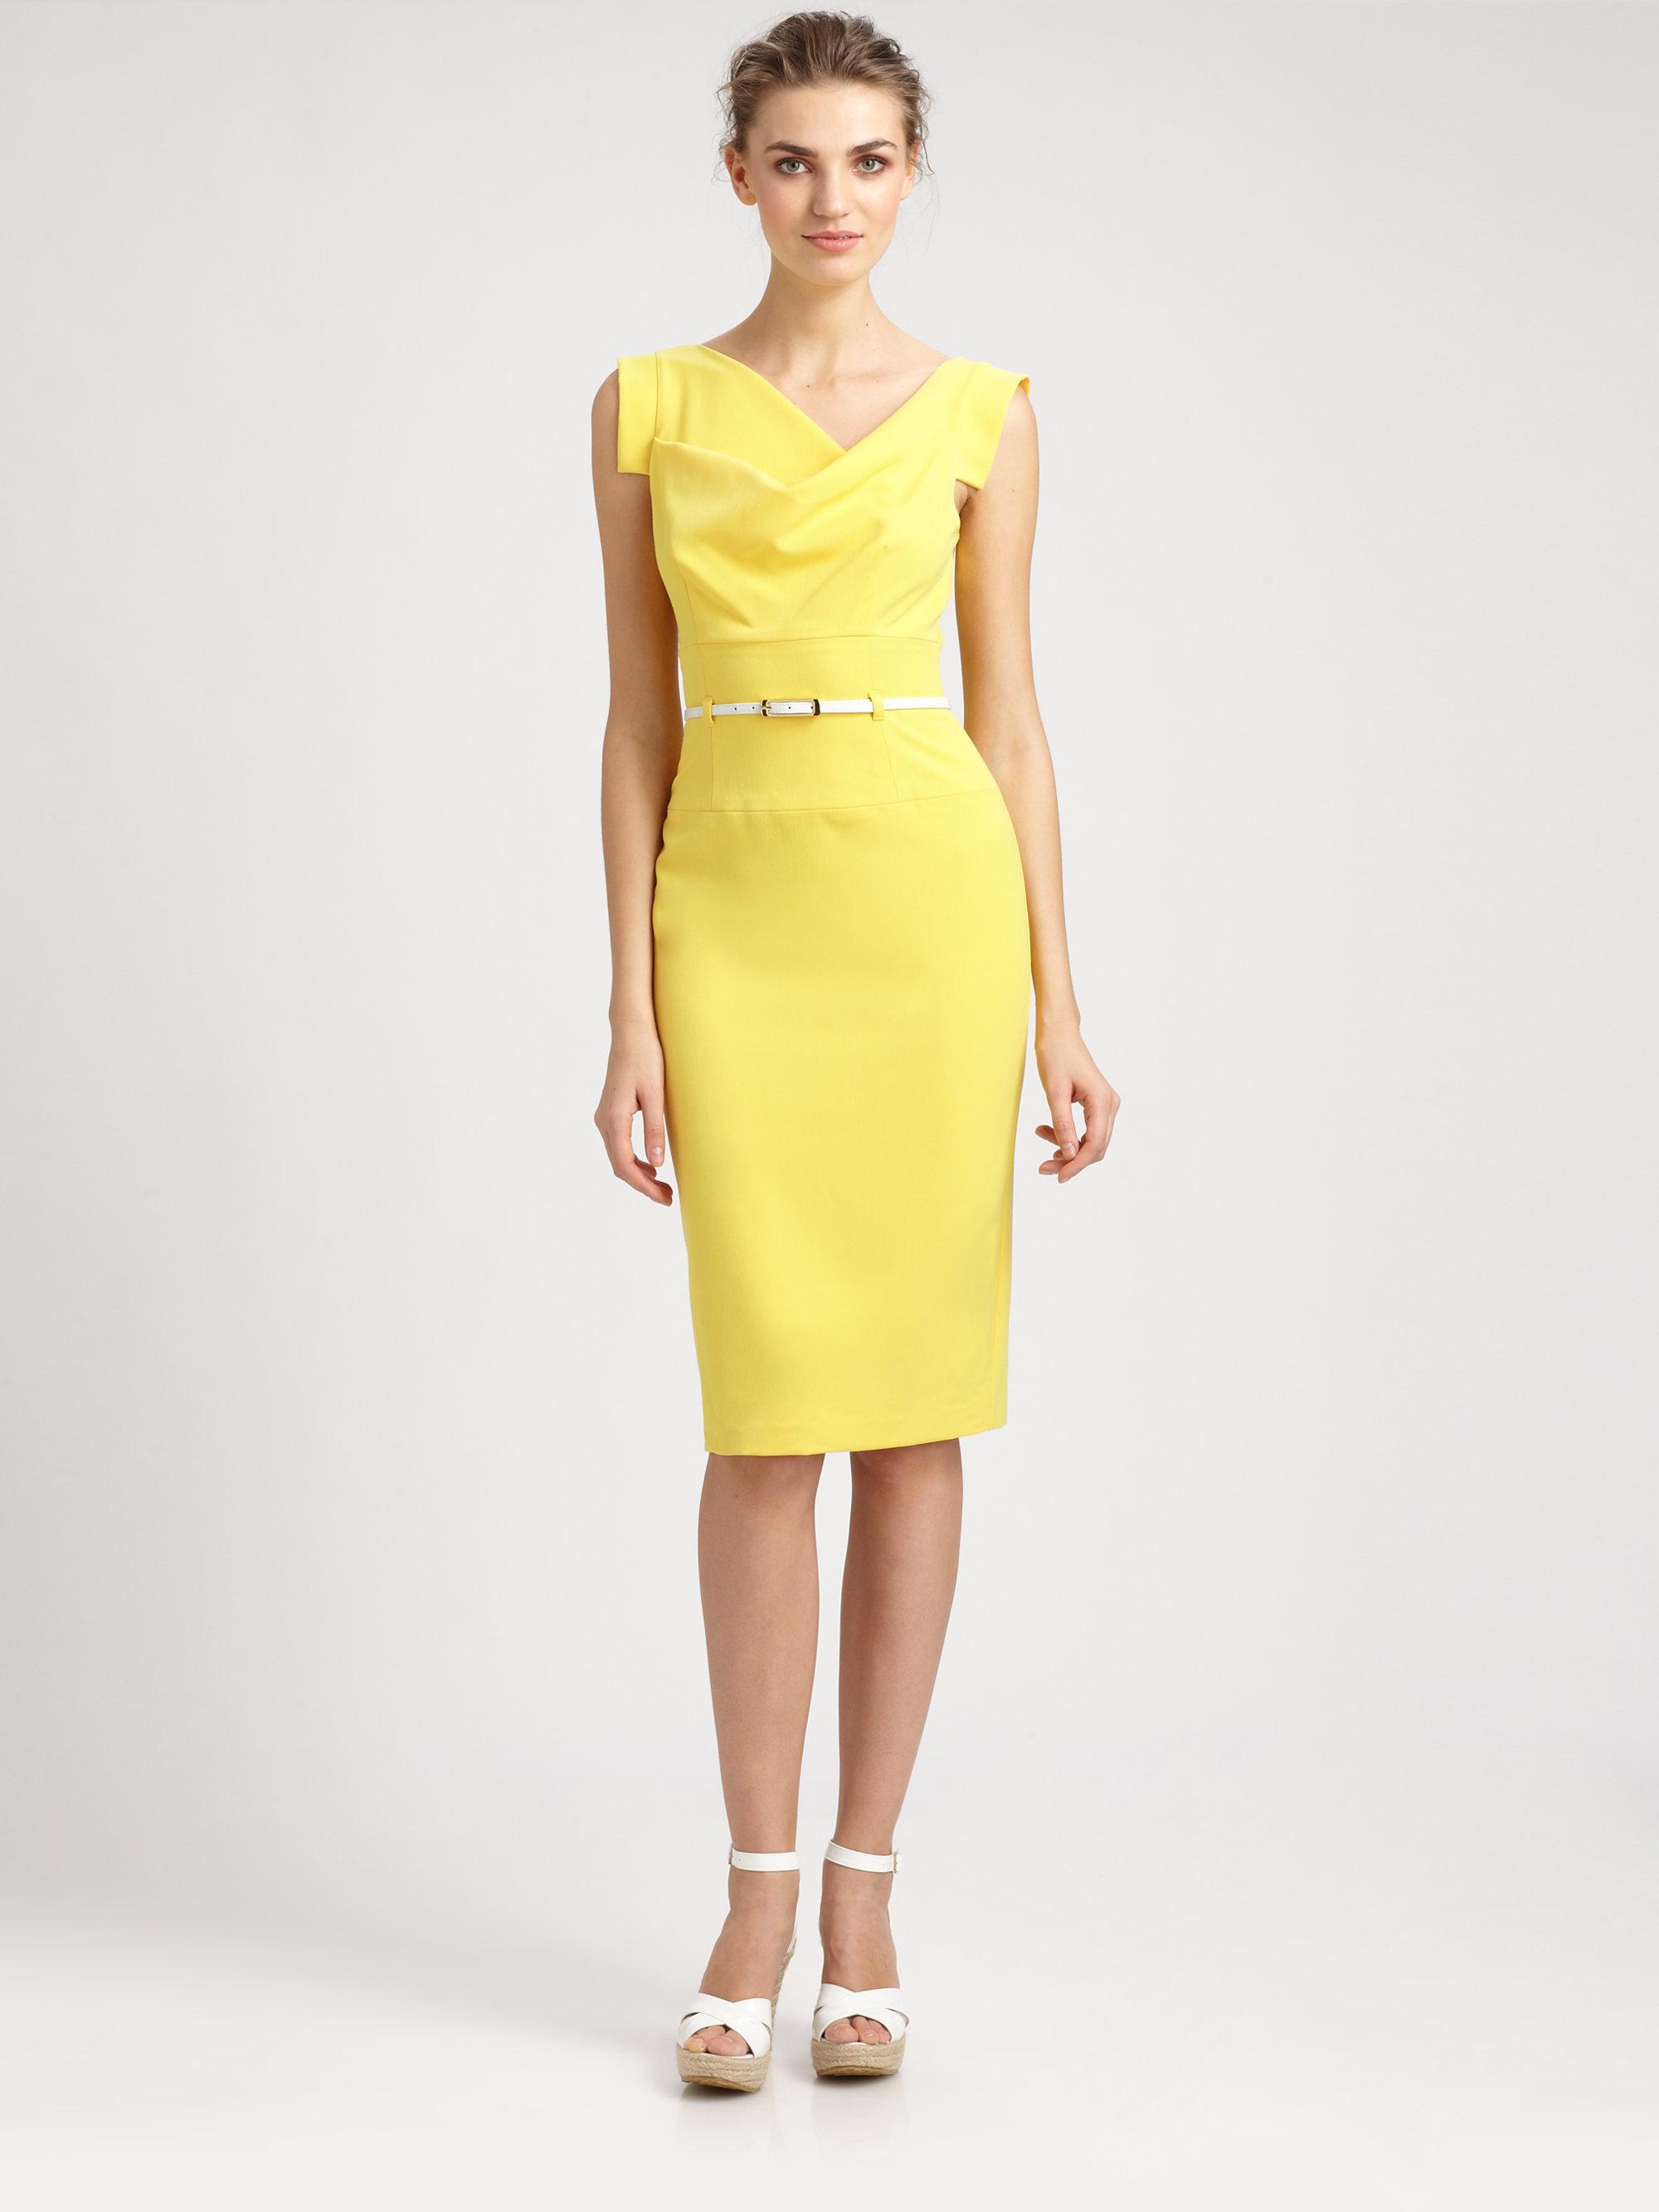 Black halo Jackie O Dress in Yellow  Lyst